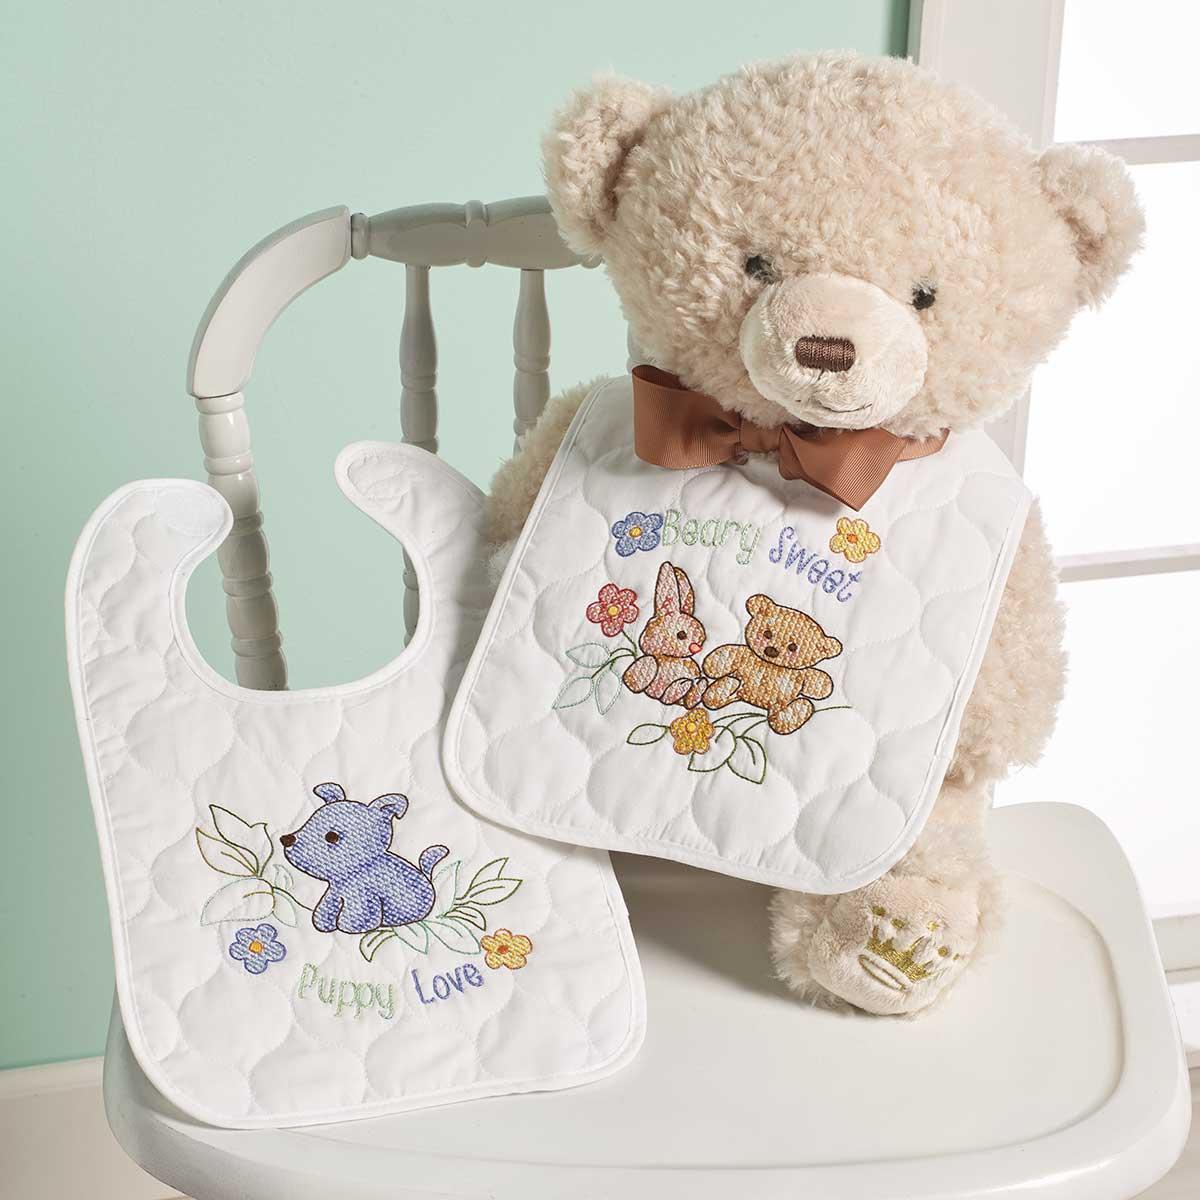 Bucilla ® Baby - Stamped Cross Stitch - Crib Ensembles - Hallmark - Playful Pals - Bib Pair Kit